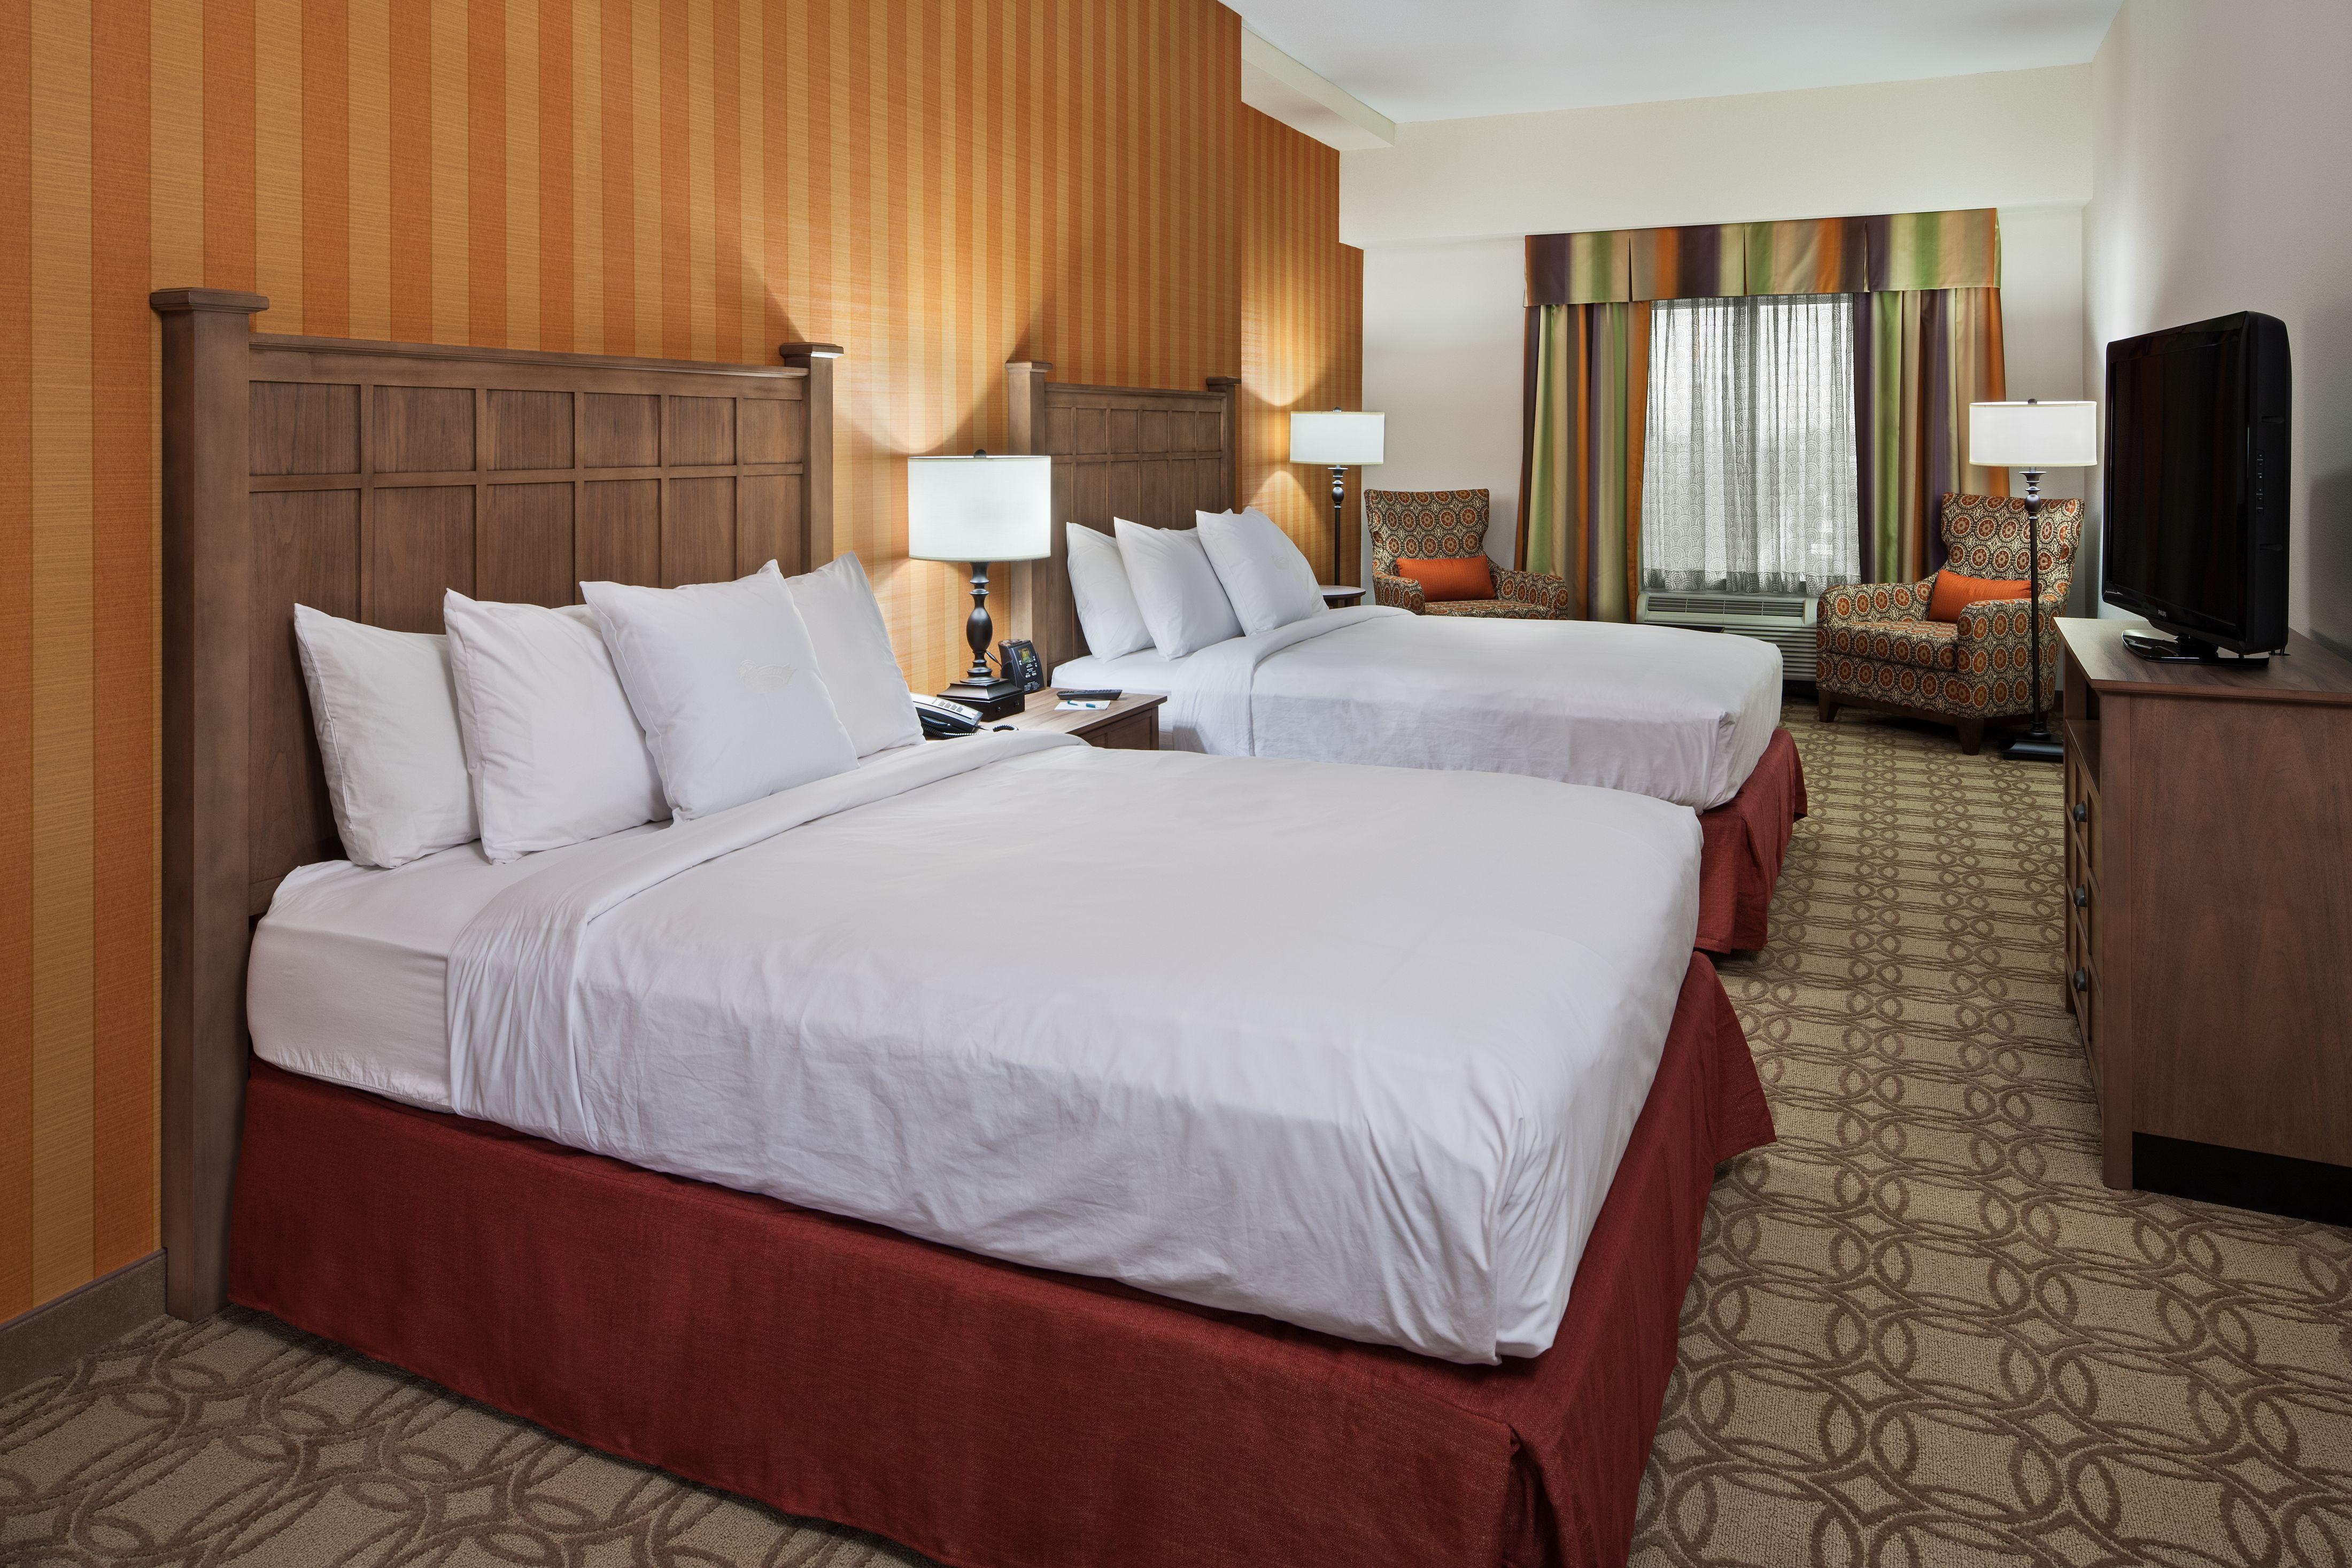 Hilton Garden Inn Homewood Suites By Hilton Lpbc Atlanta Architecture